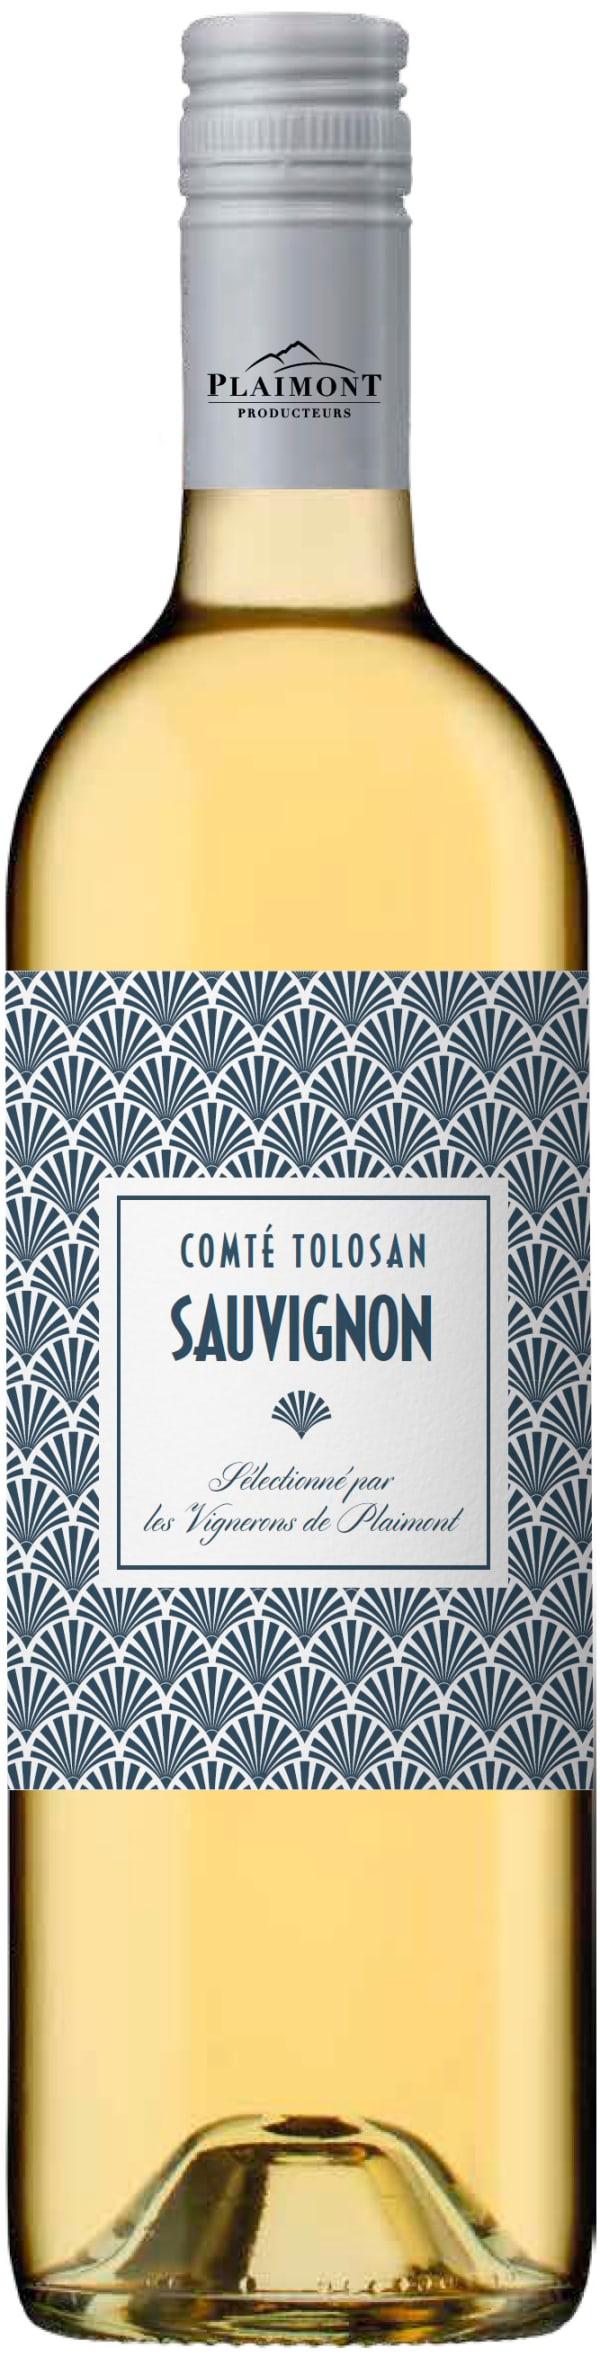 Plaimont Sauvignon 2018